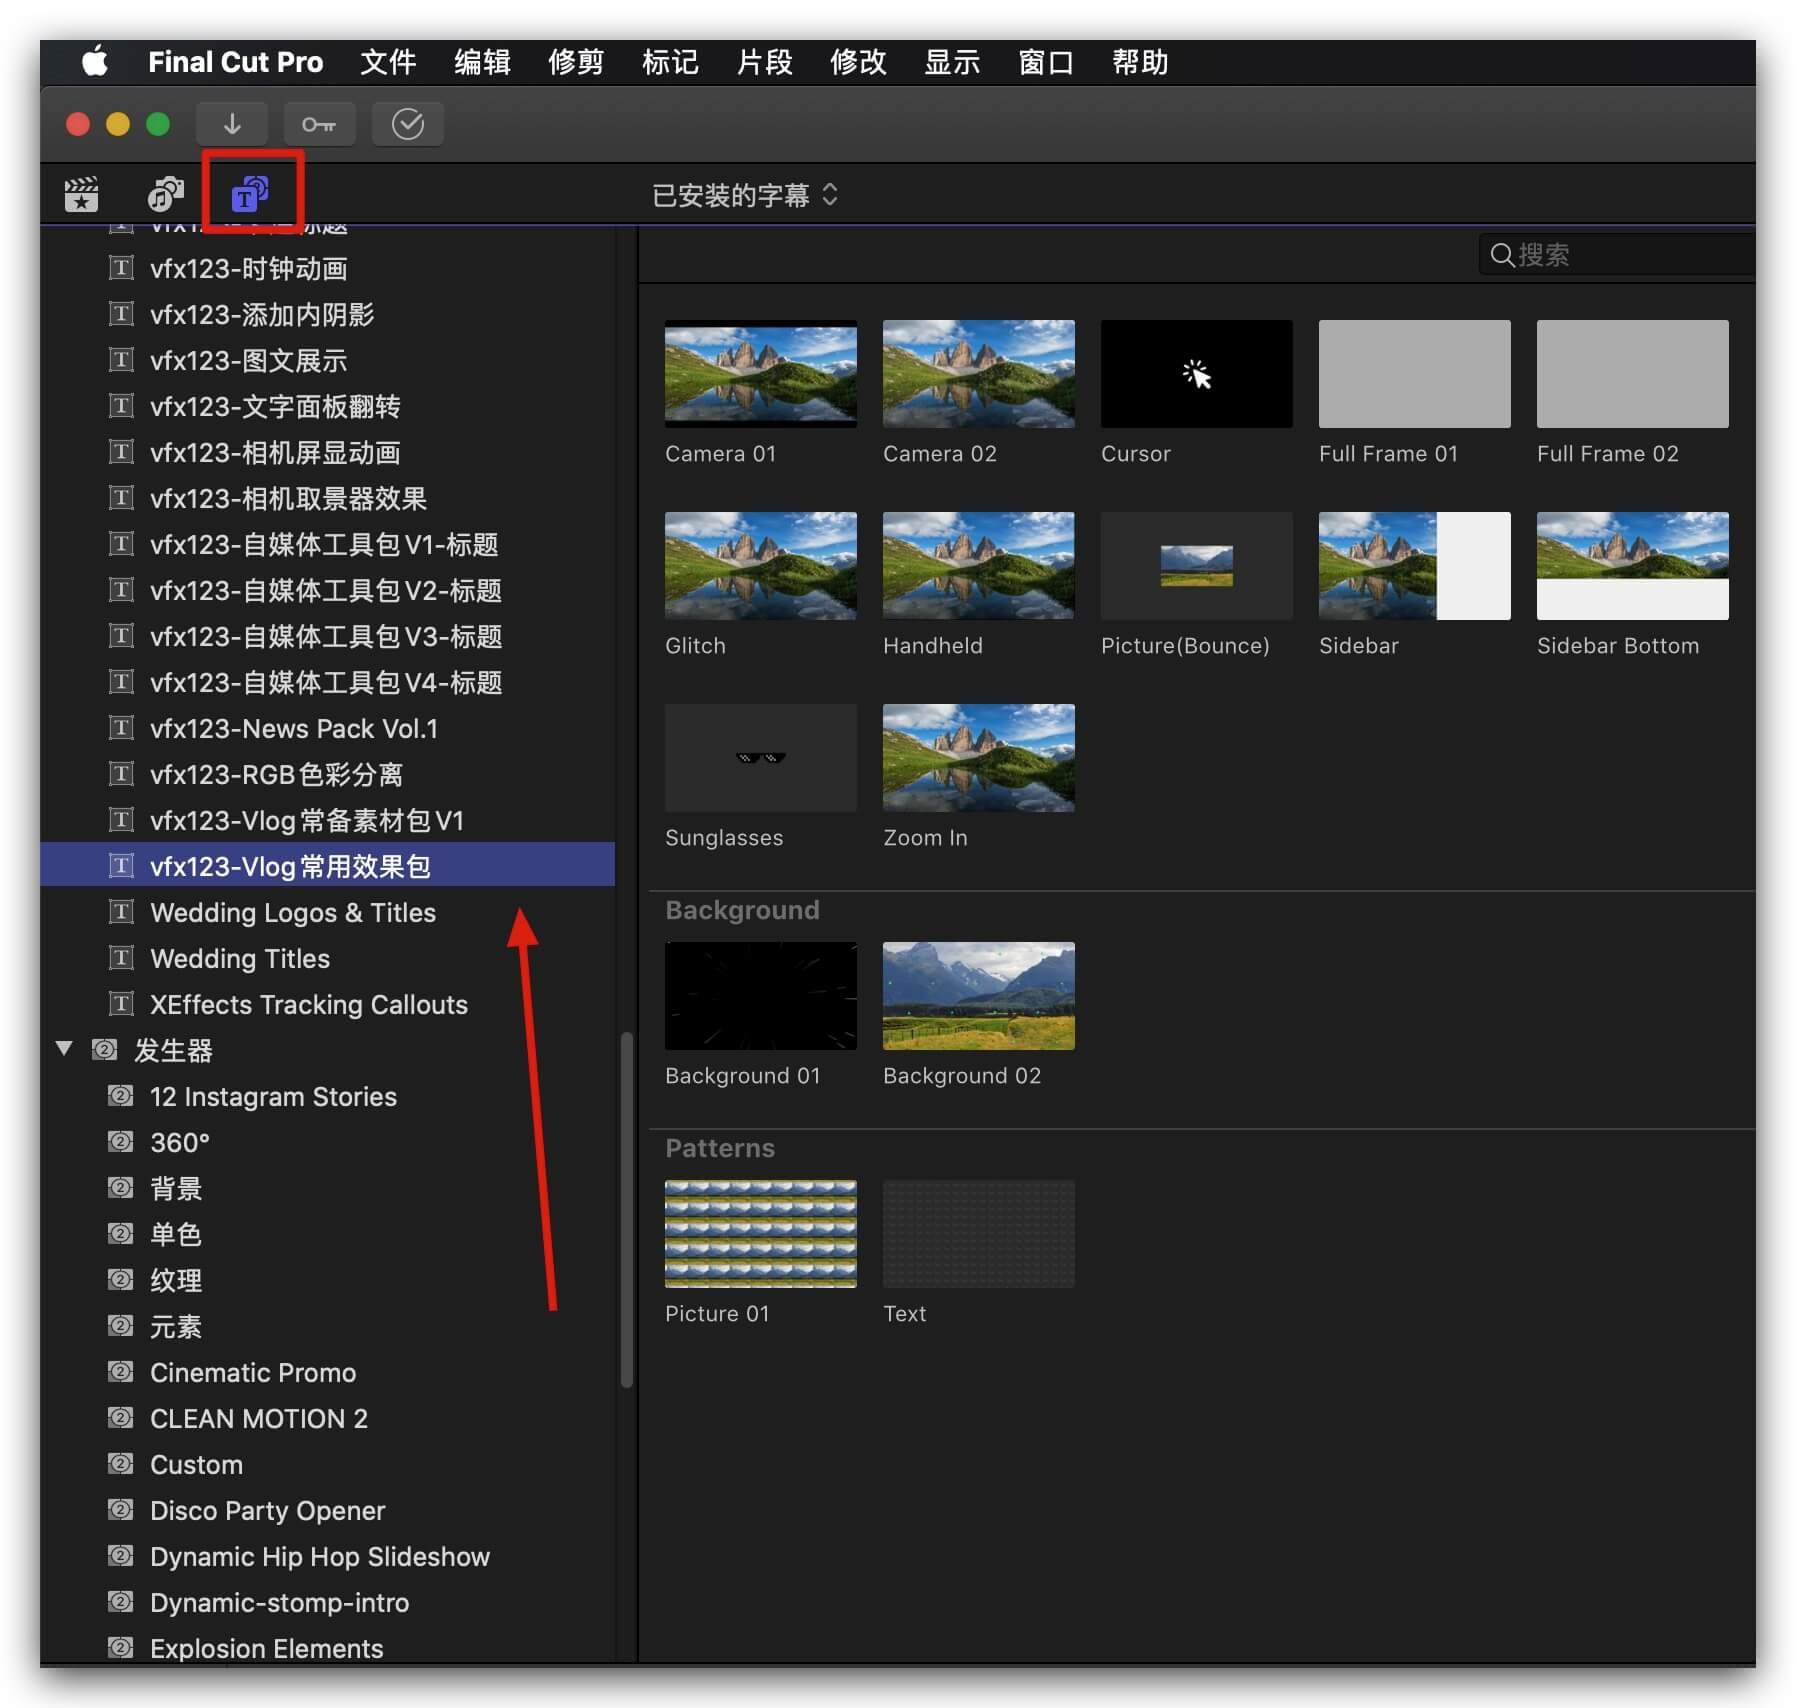 fcpx插件 16个Vlog影片制作常用素材包 快门对焦多图弹出侧底栏鼠标太阳镜等